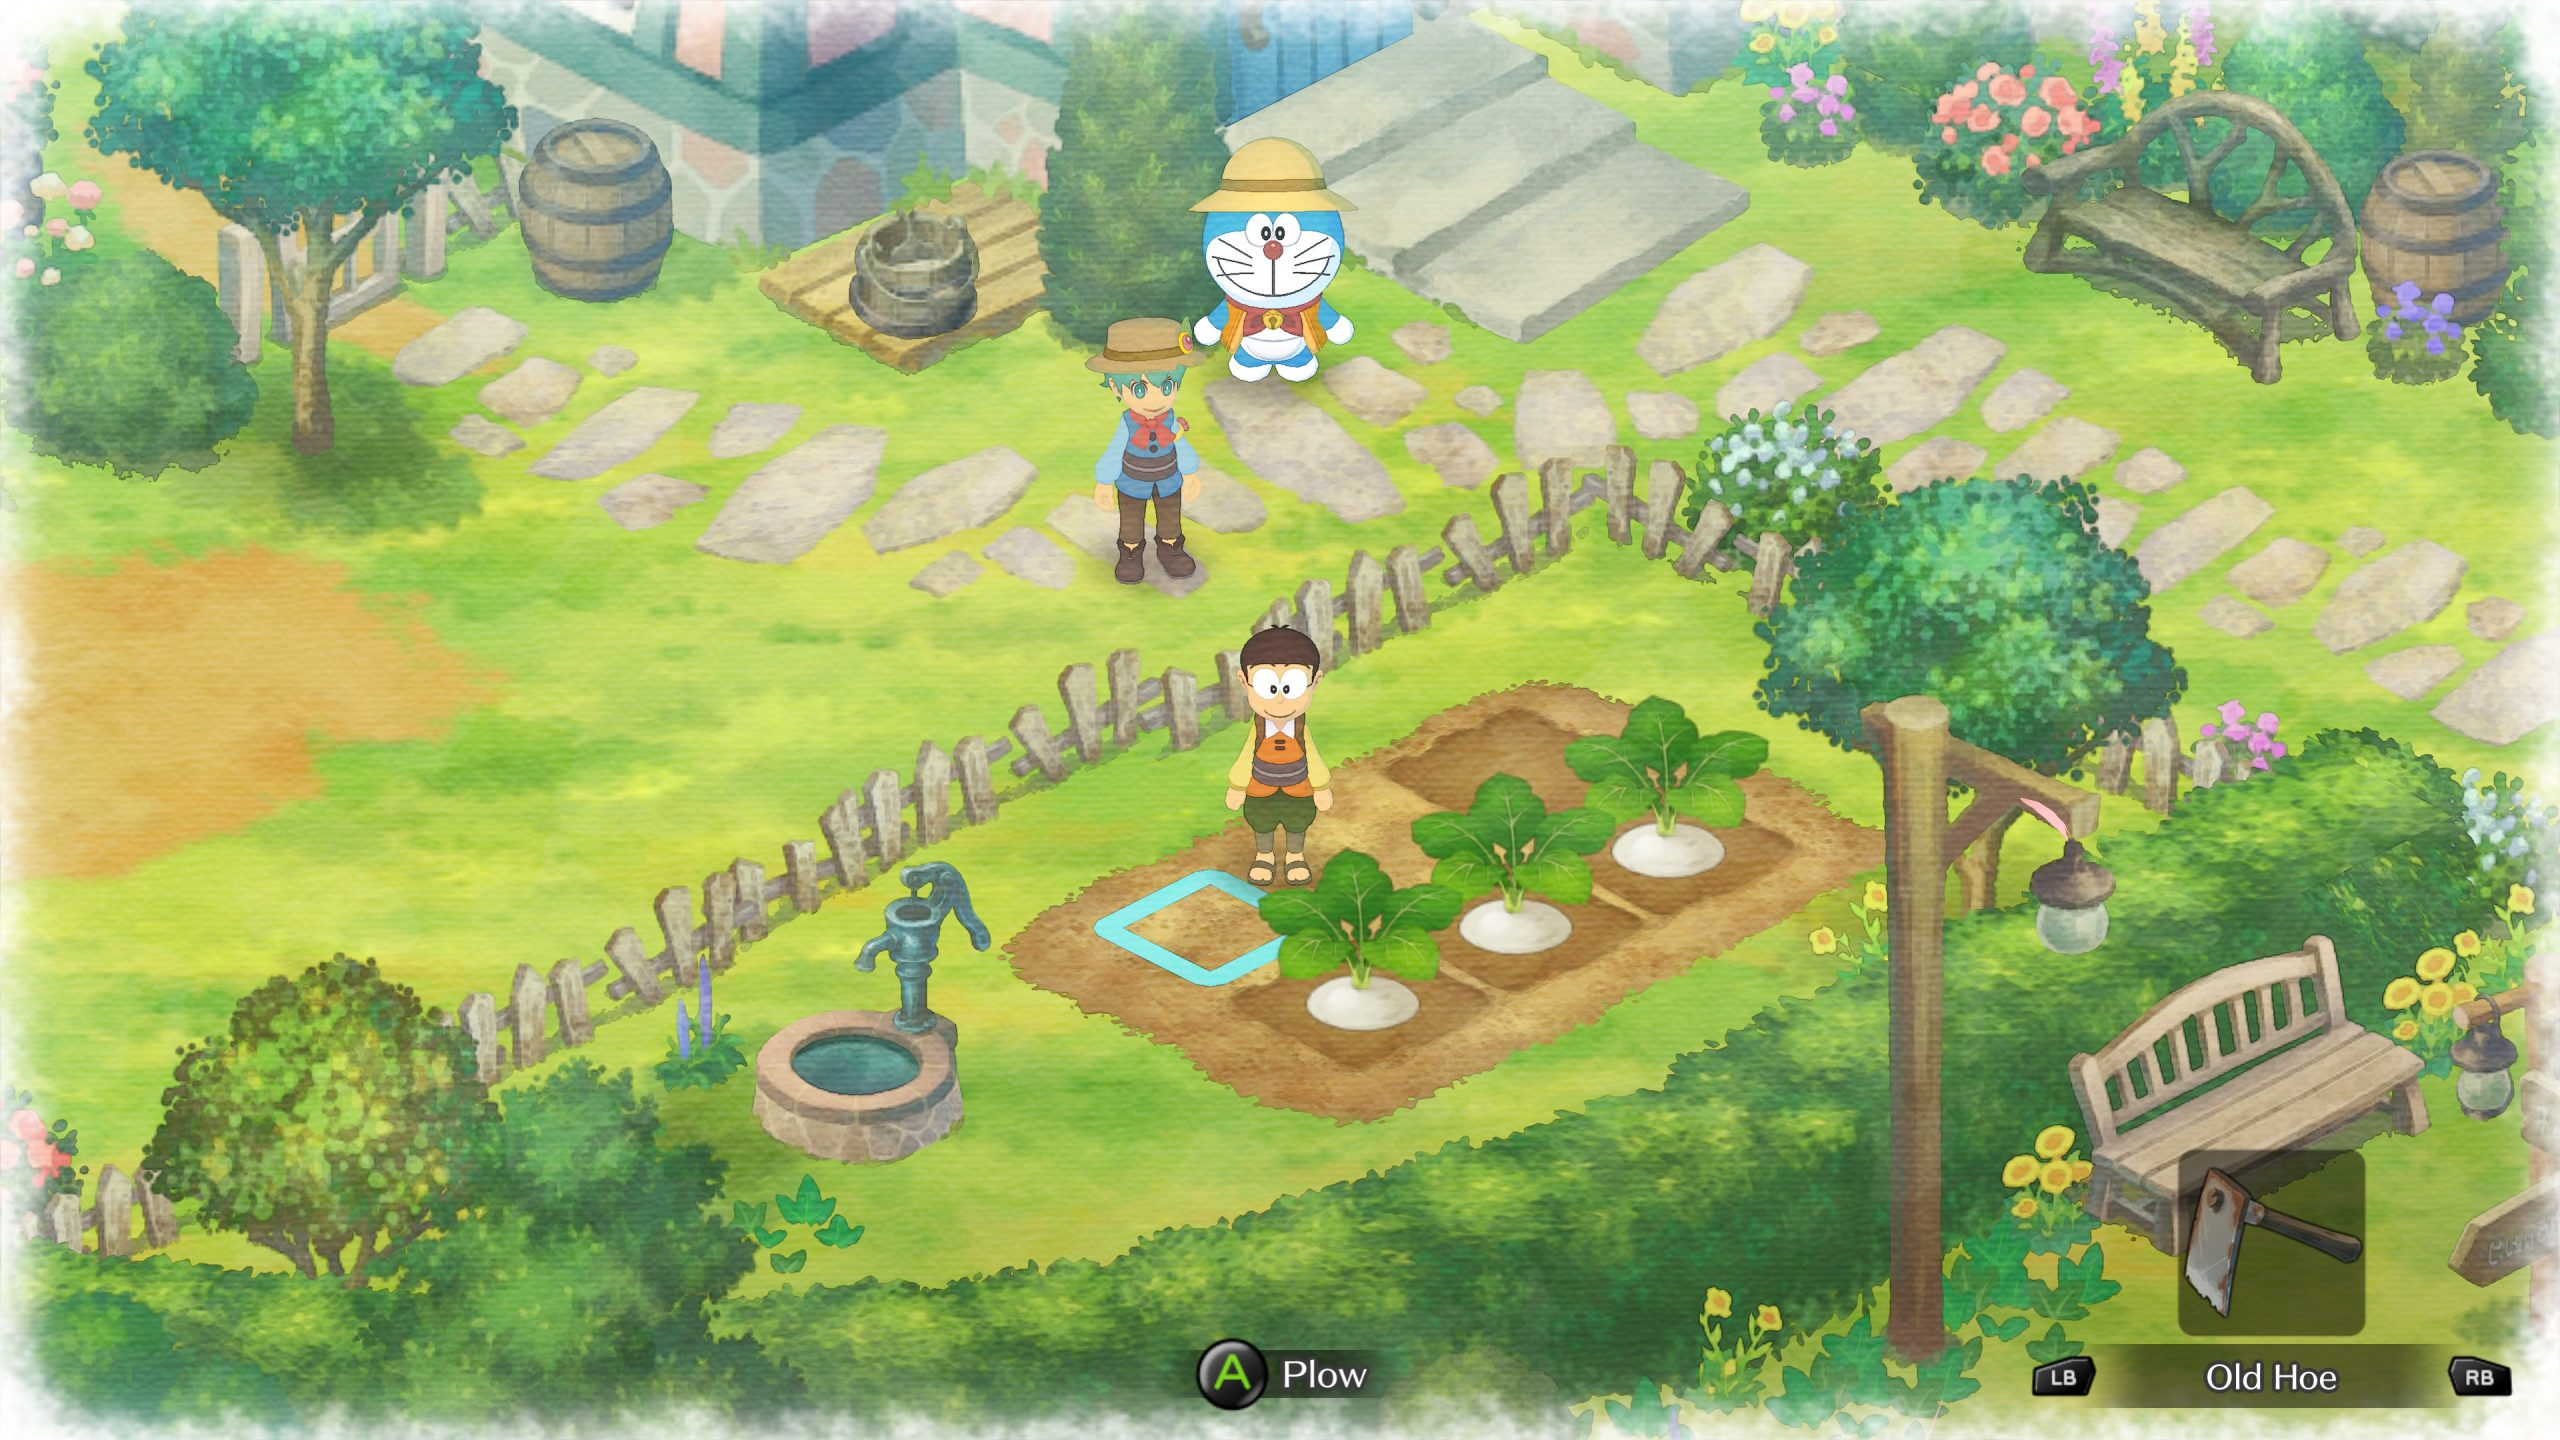 doraemon-story-of-seasons-game-farm-simulation